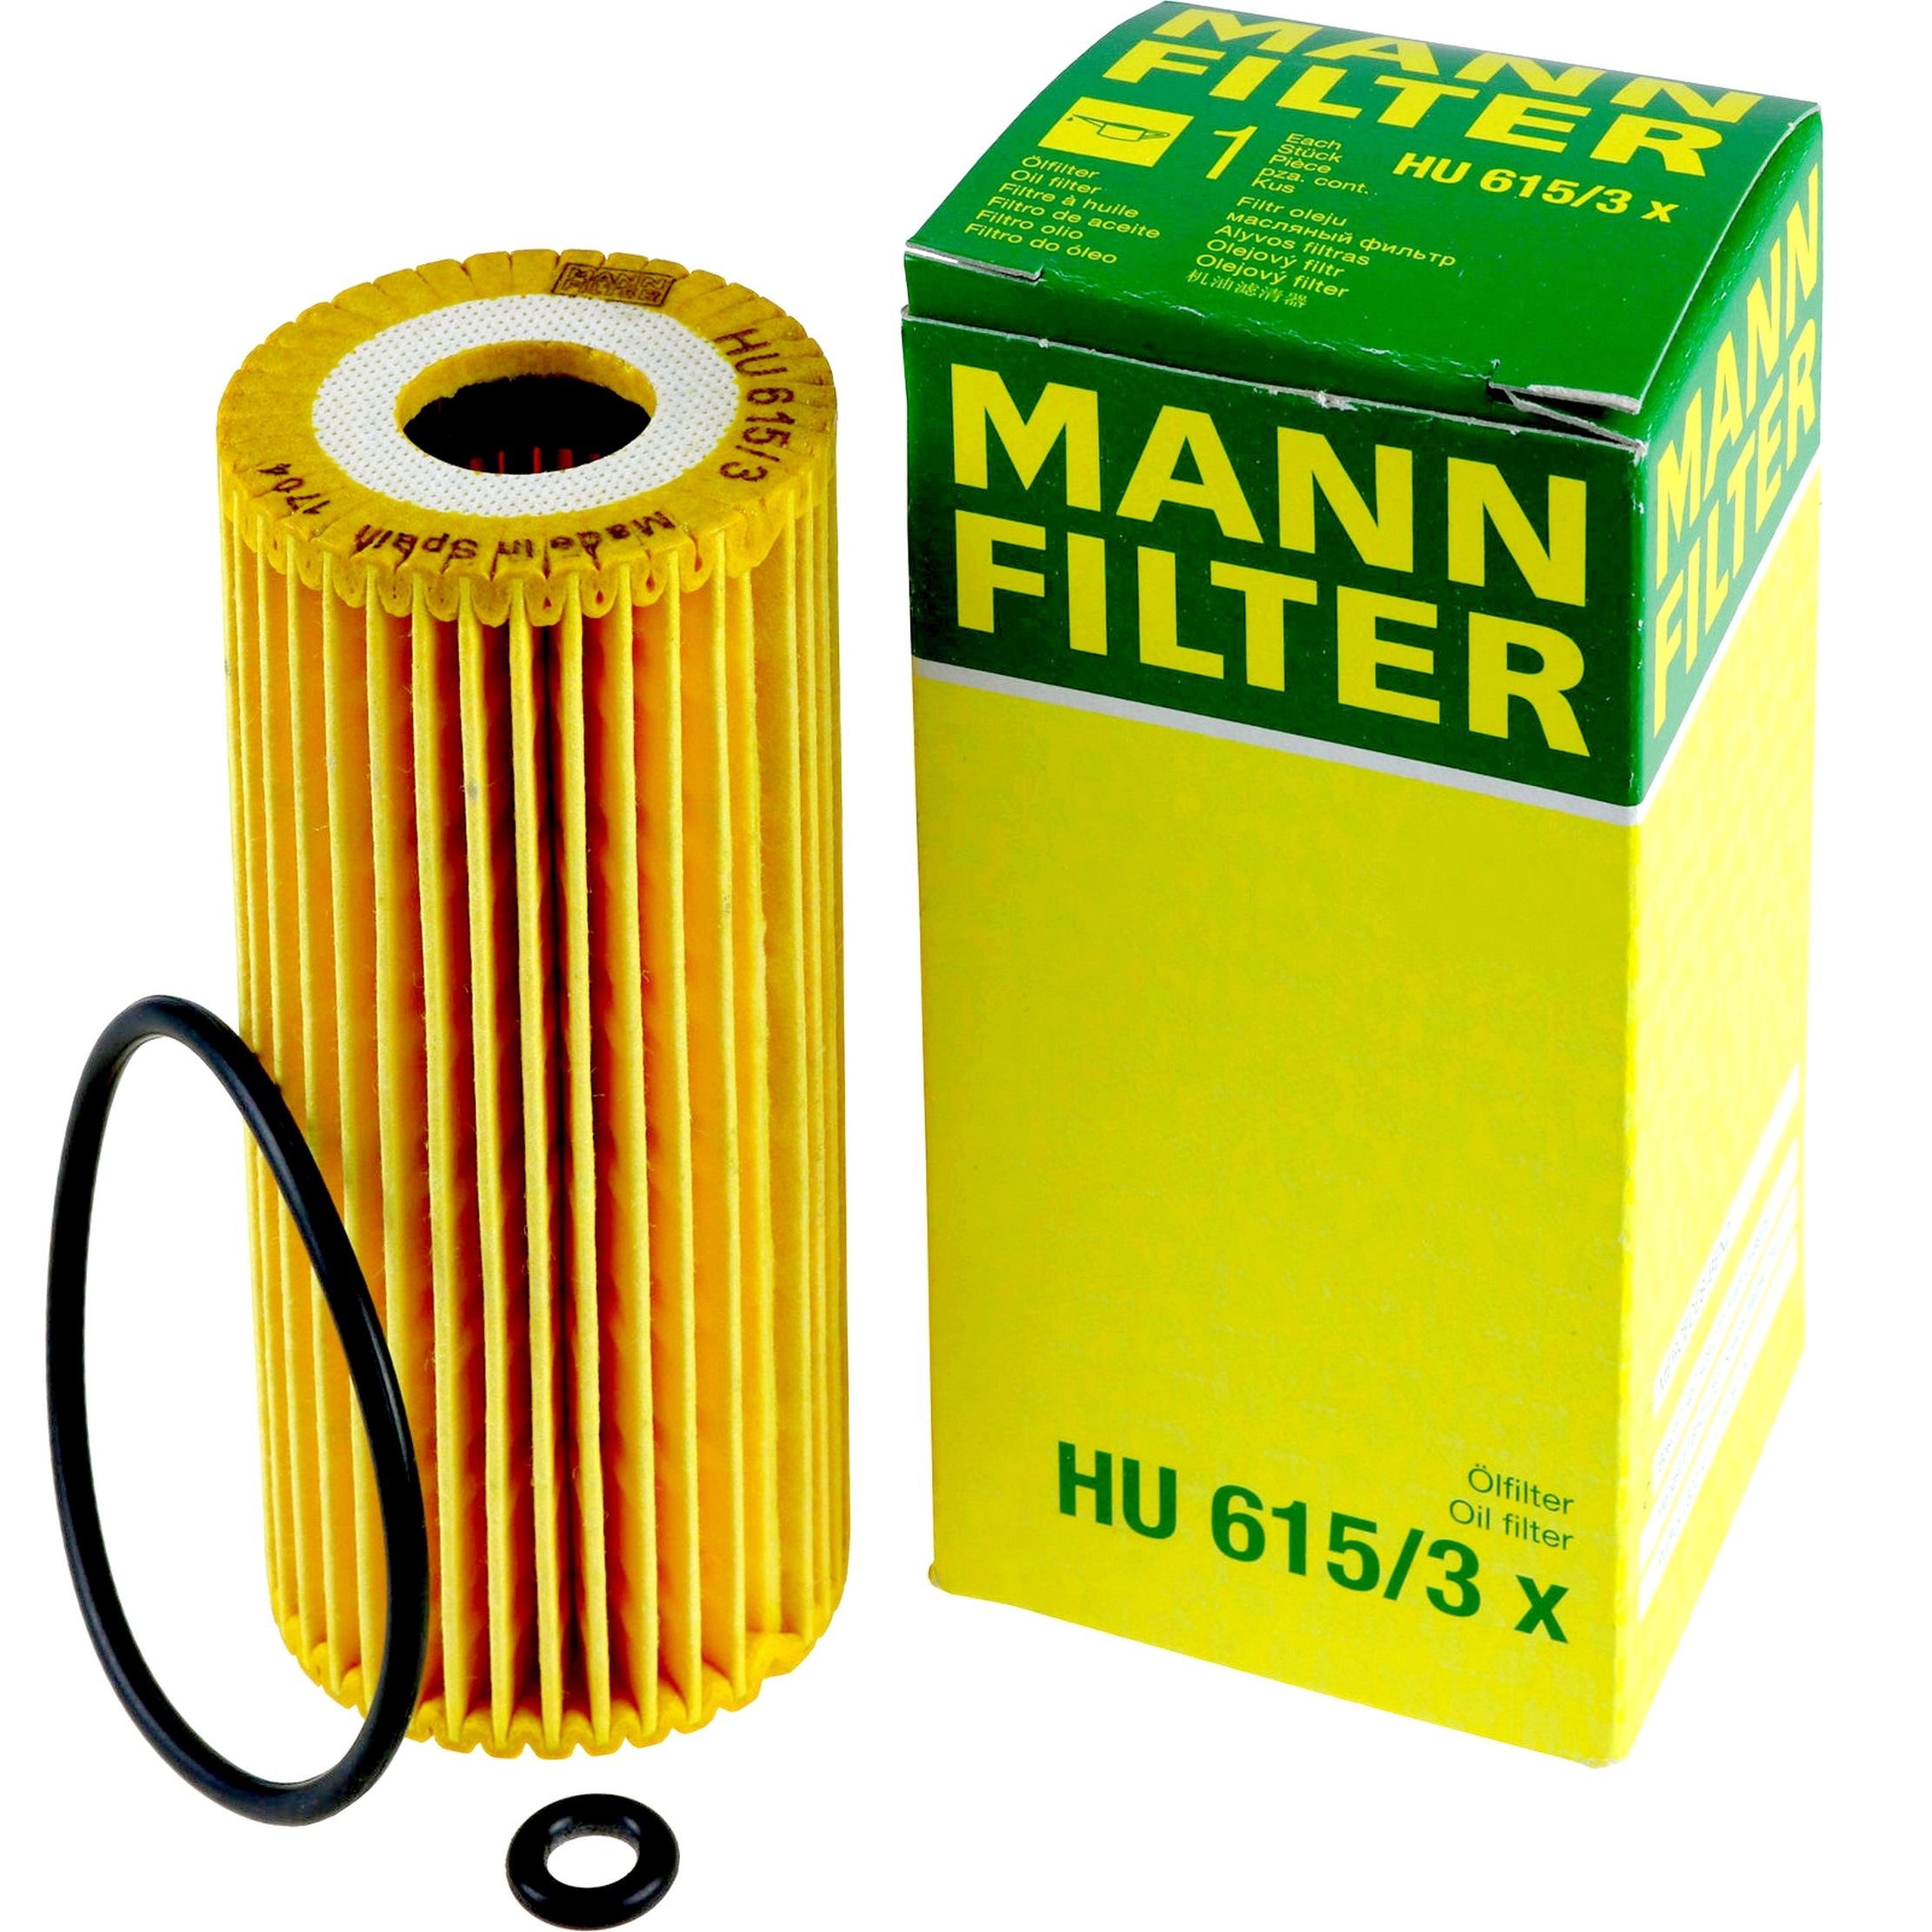 MANN-FILTER Ölfilter HU615//3x für MERCEDES-BENZ